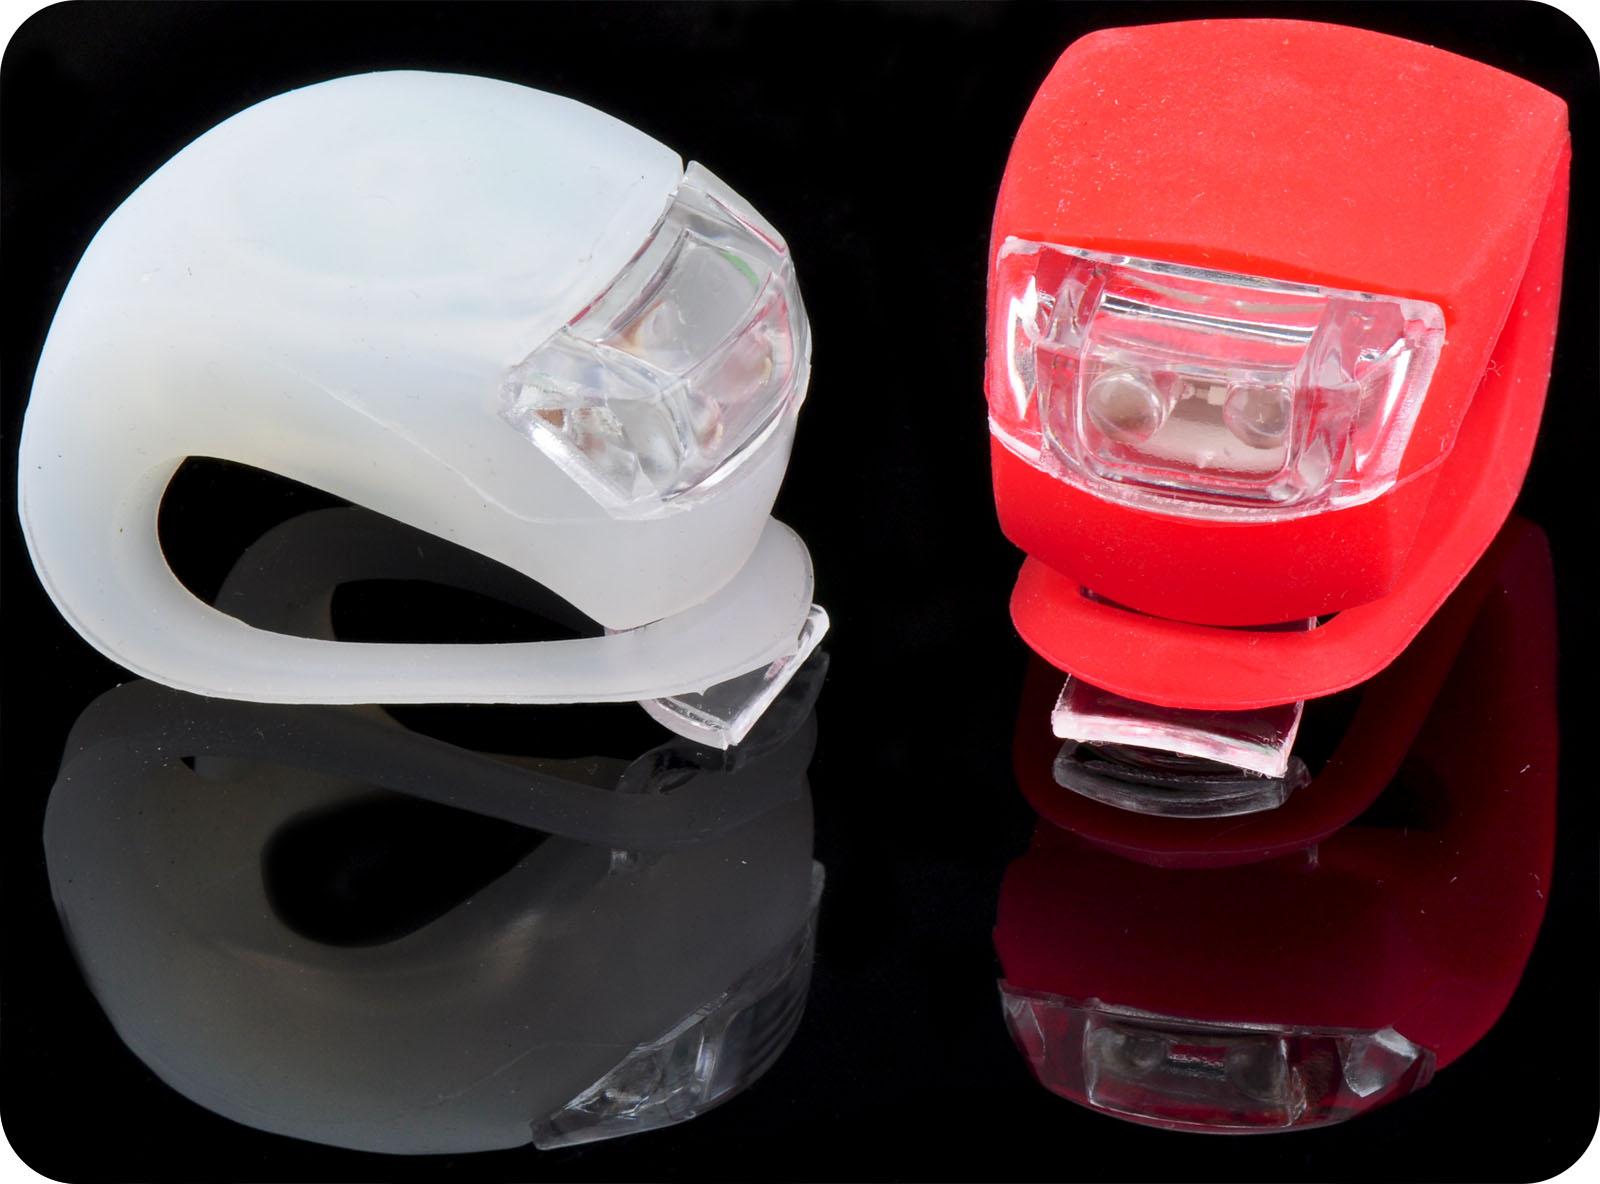 Luci per bici decathlon luce posteriore led cl usb decathlon